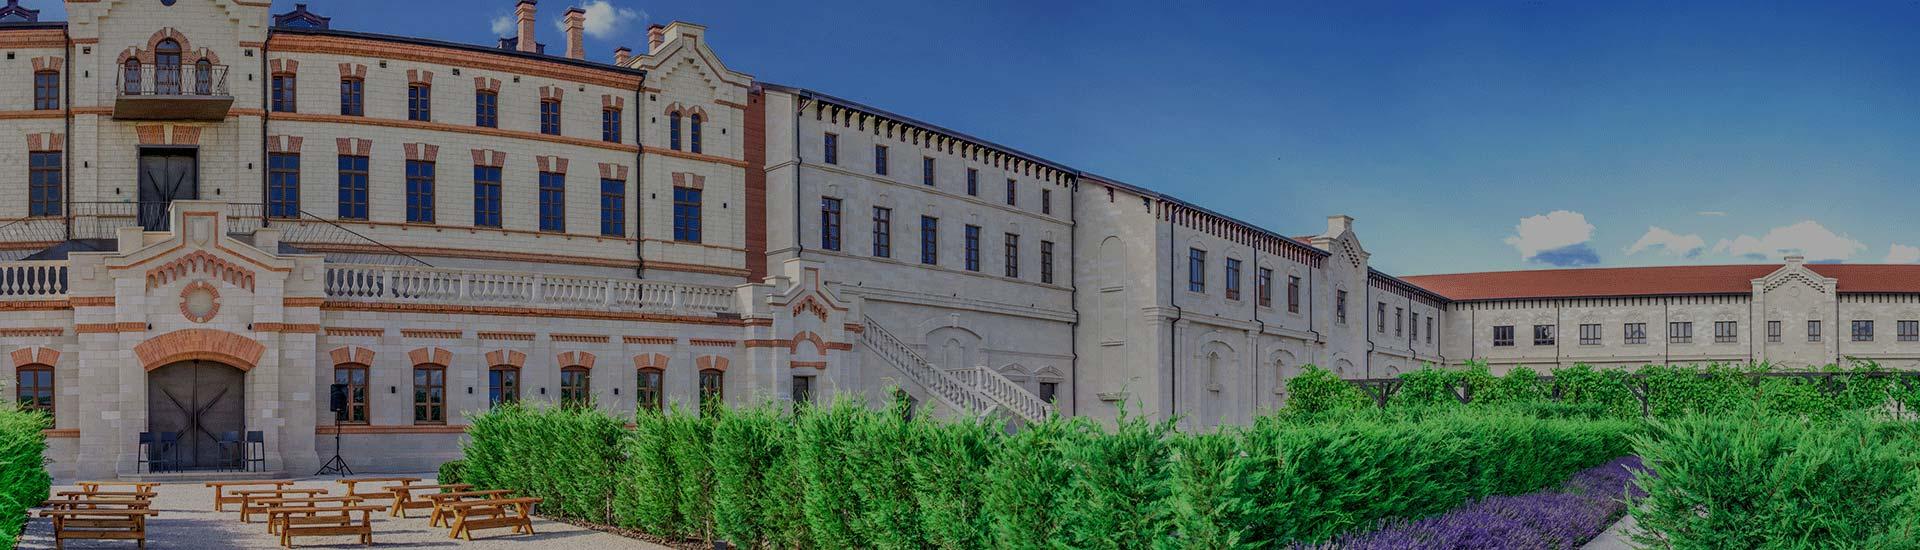 Spedition-Moldawien-Logistikunternehmen